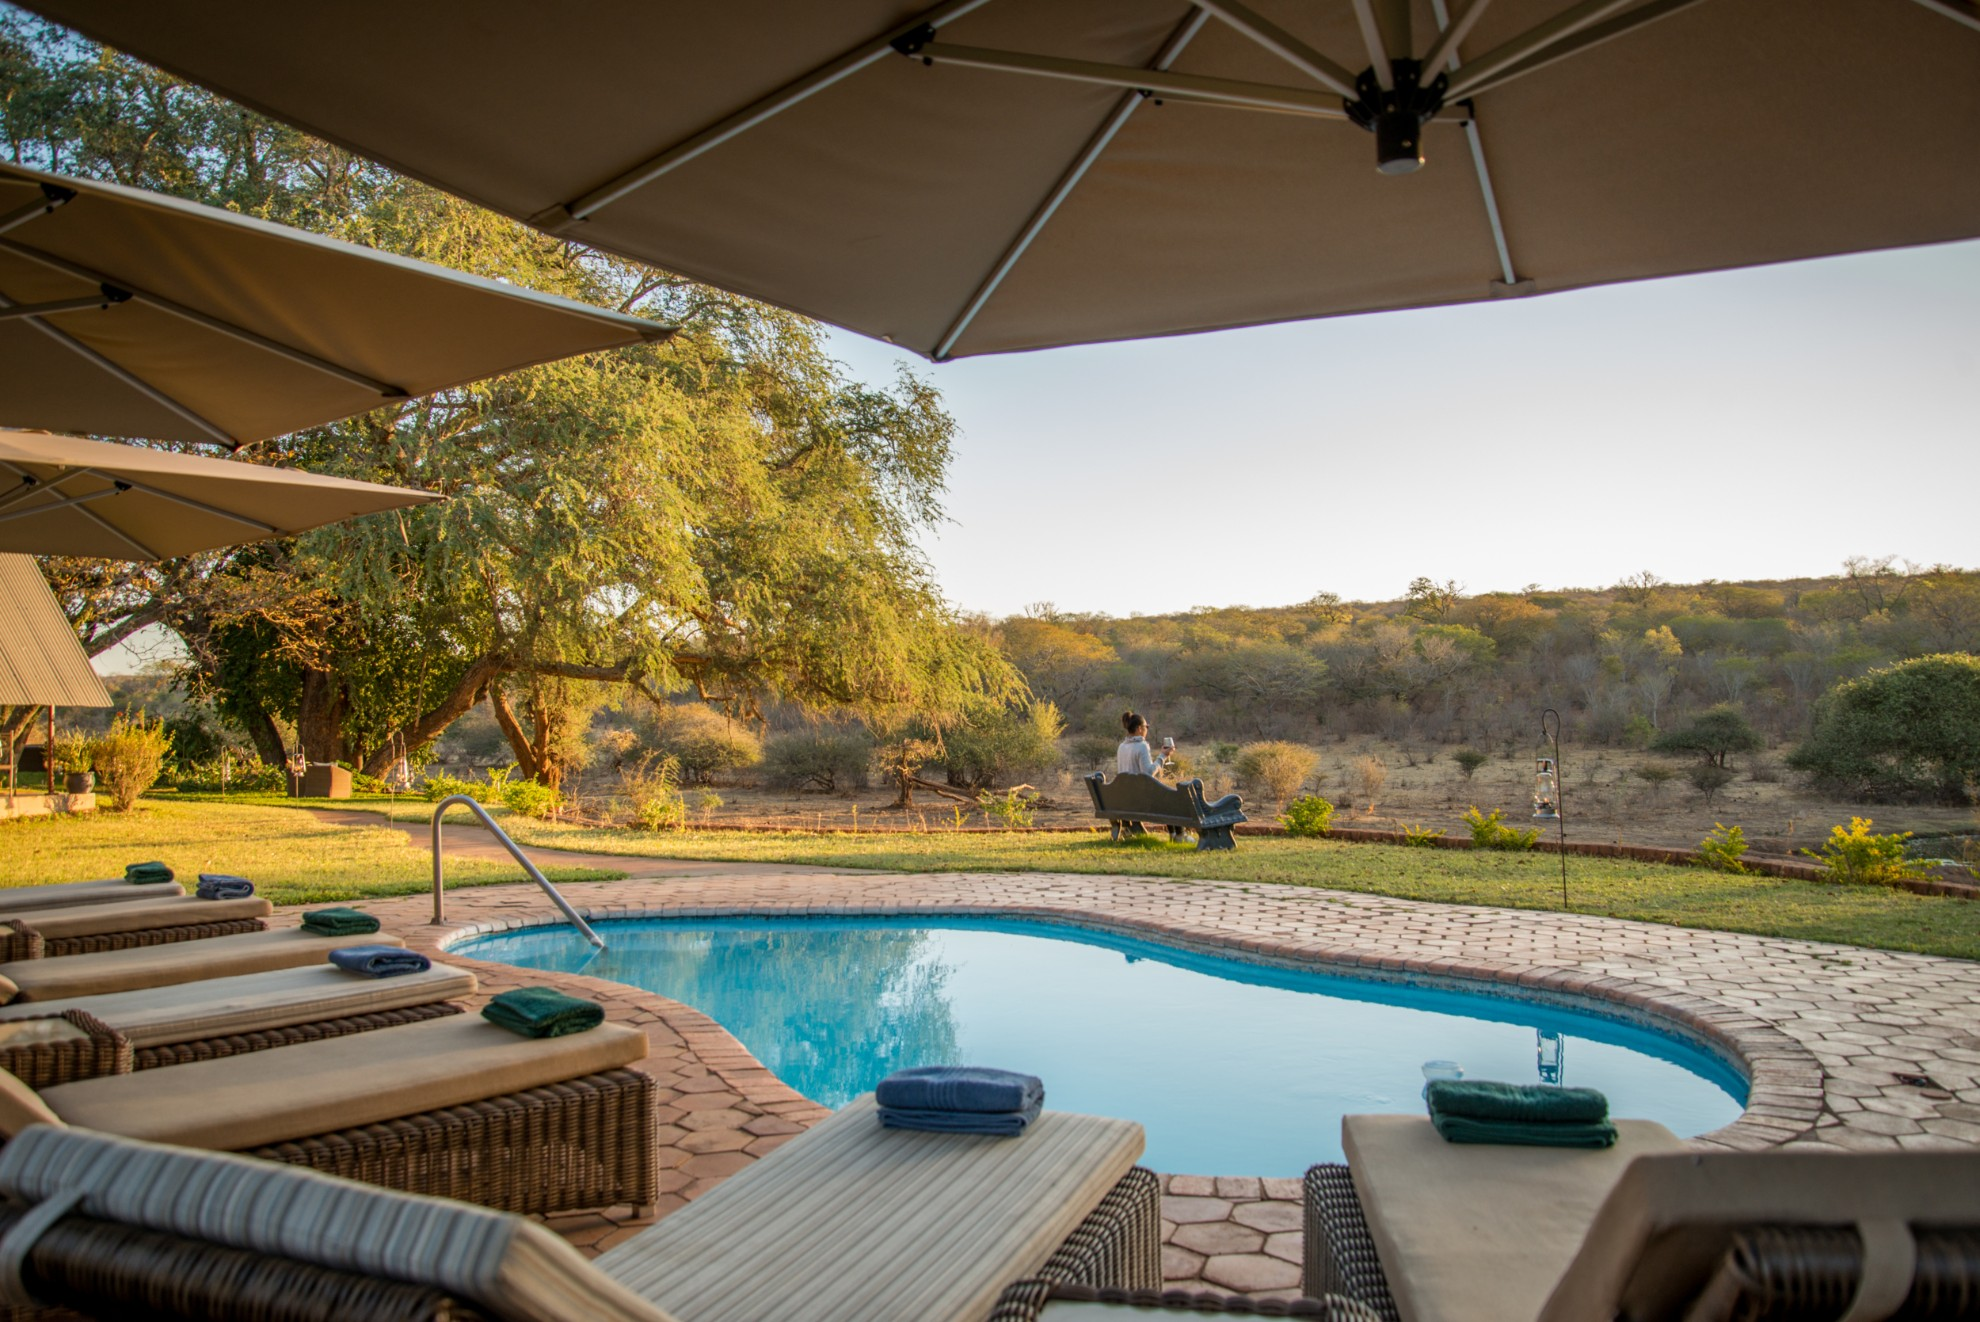 Ursula's Homestead Victoria Falls Zimbabwe Pool Views